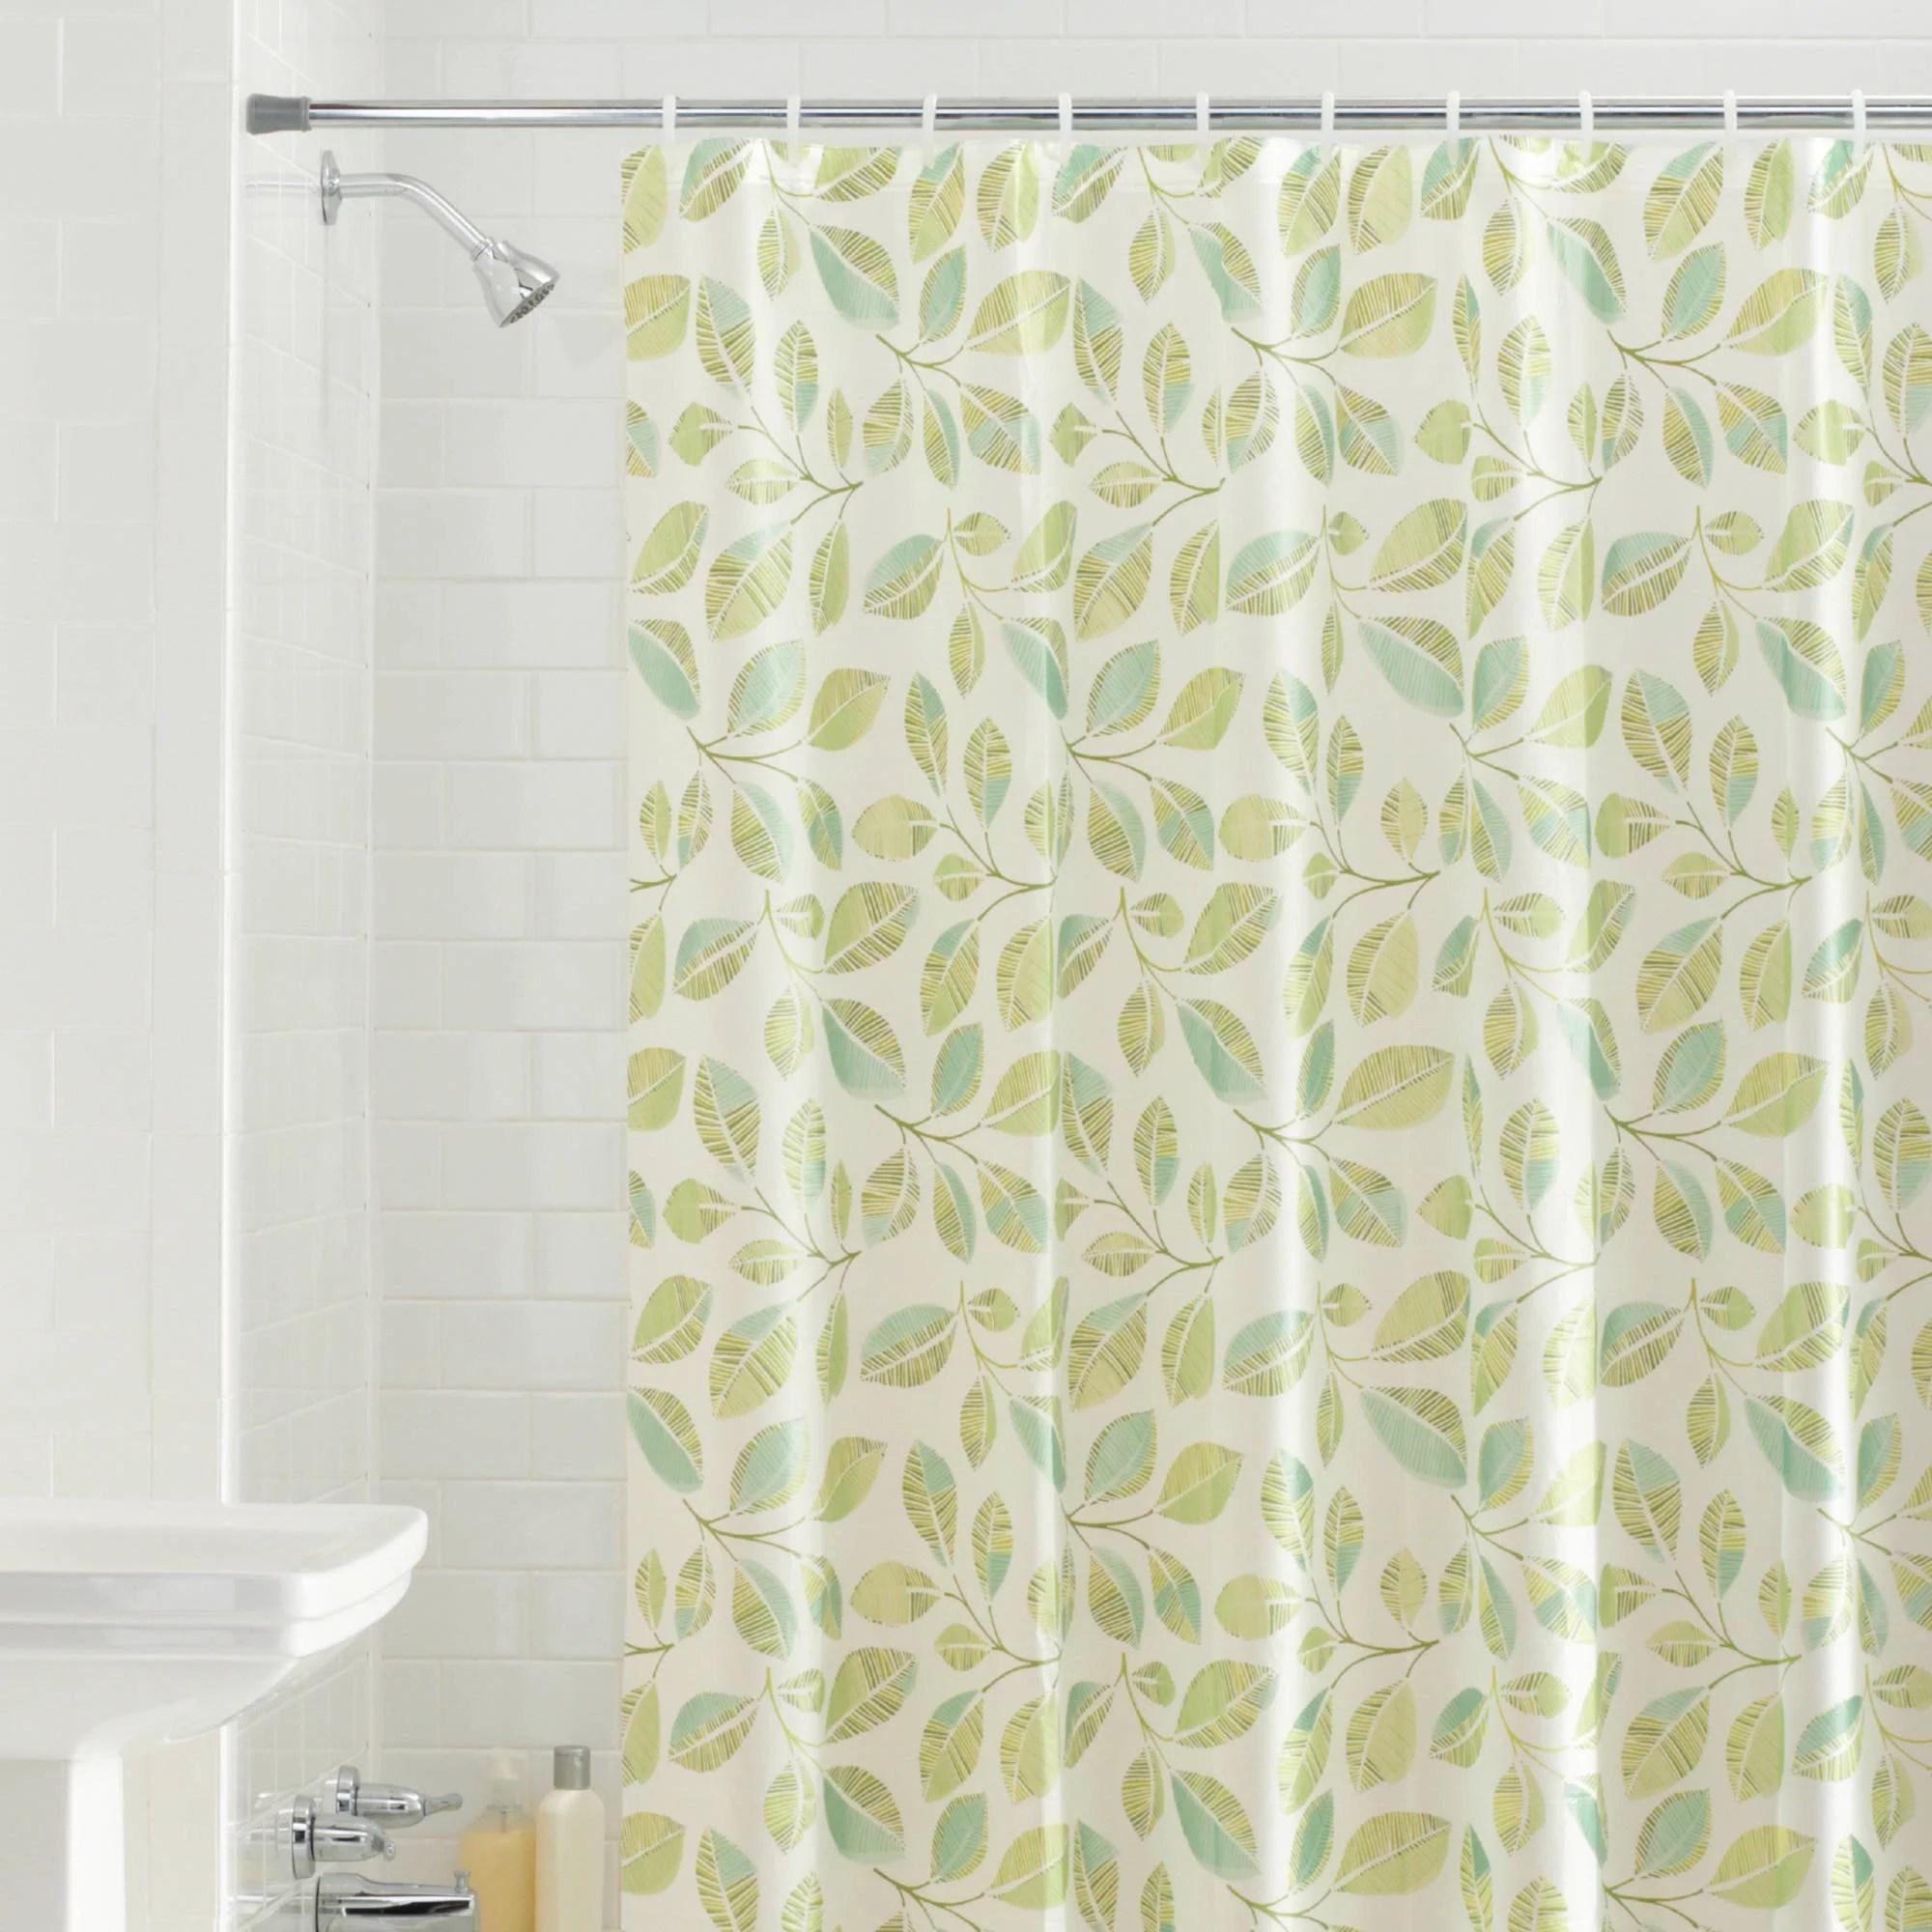 Mainstays Fiji Leaves PEVA Shower Curtain Green  Walmartcom